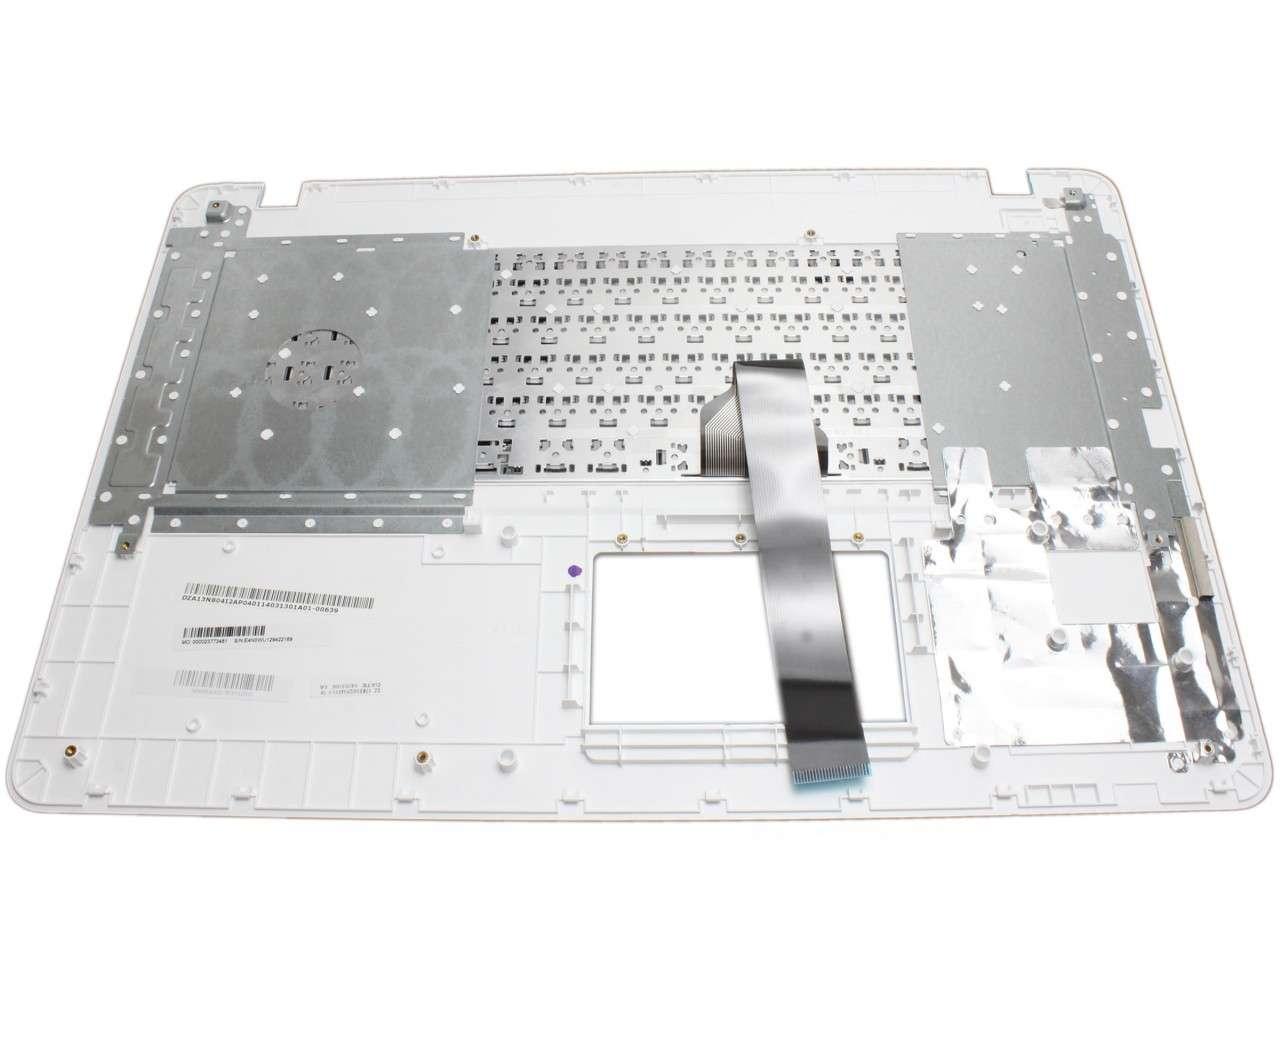 Tastatura Asus X751L neagra cu Palmrest alb imagine